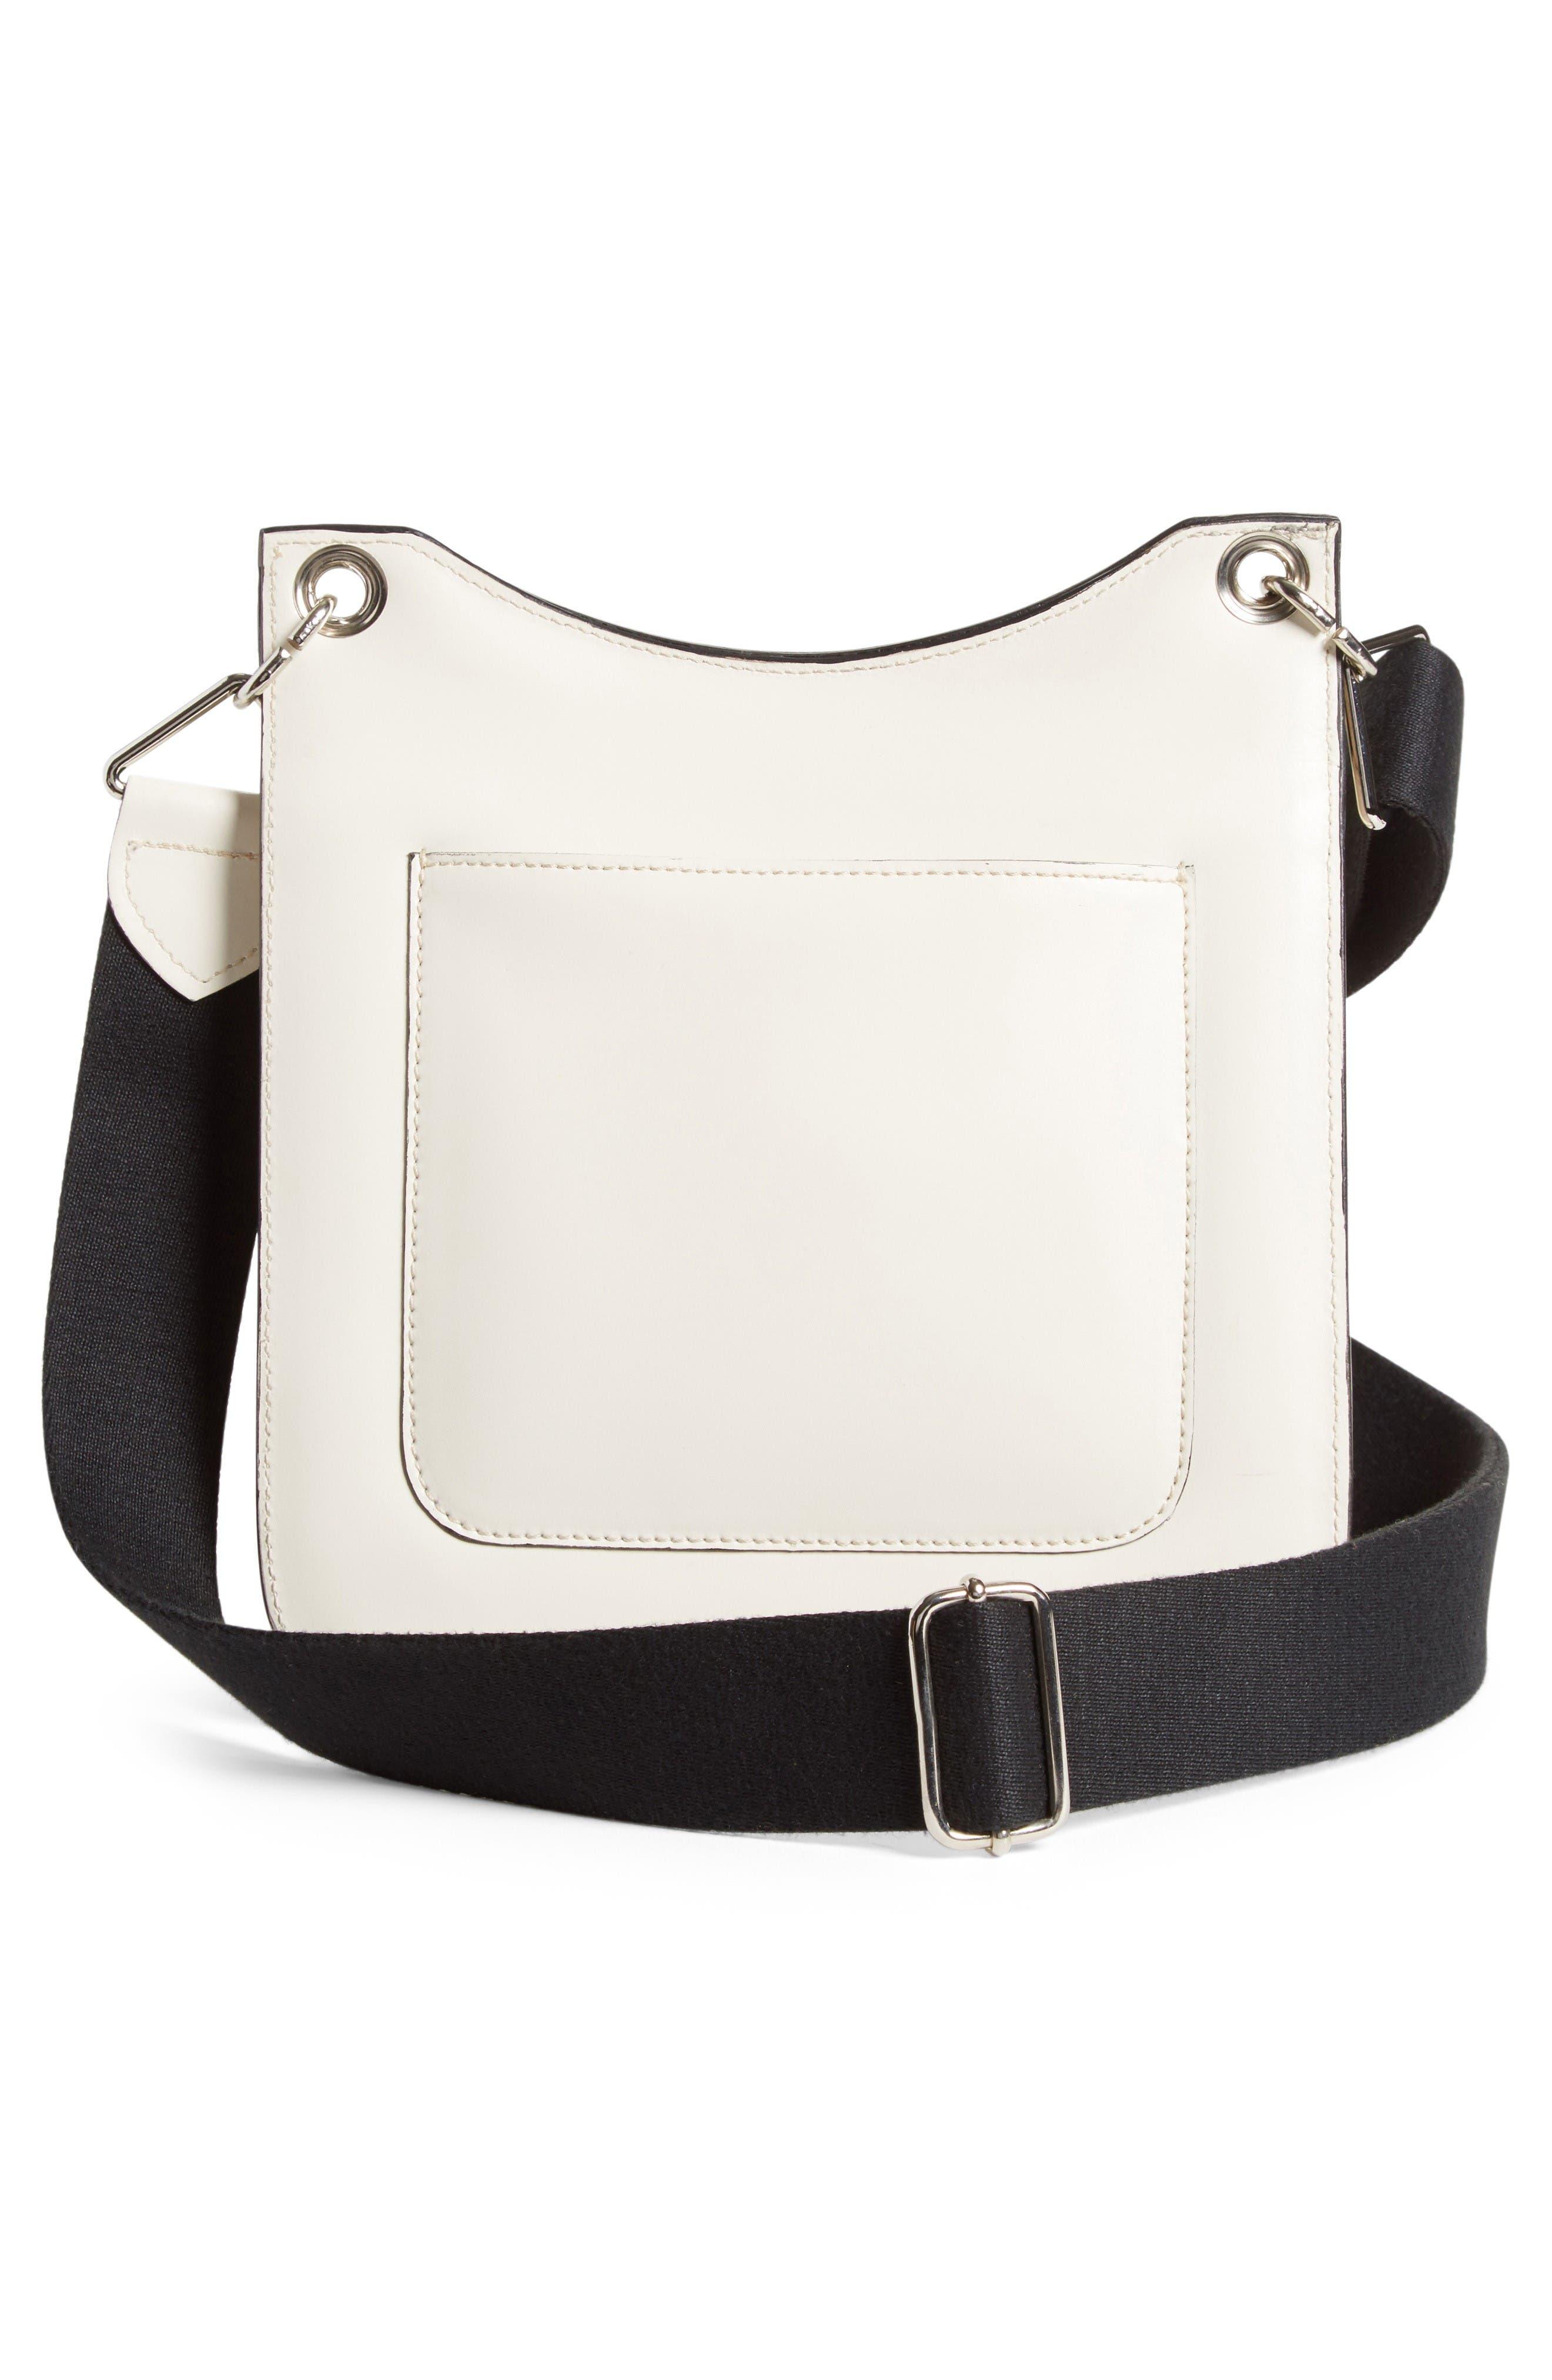 Equestrian Crossbody Bag,                             Alternate thumbnail 3, color,                             White